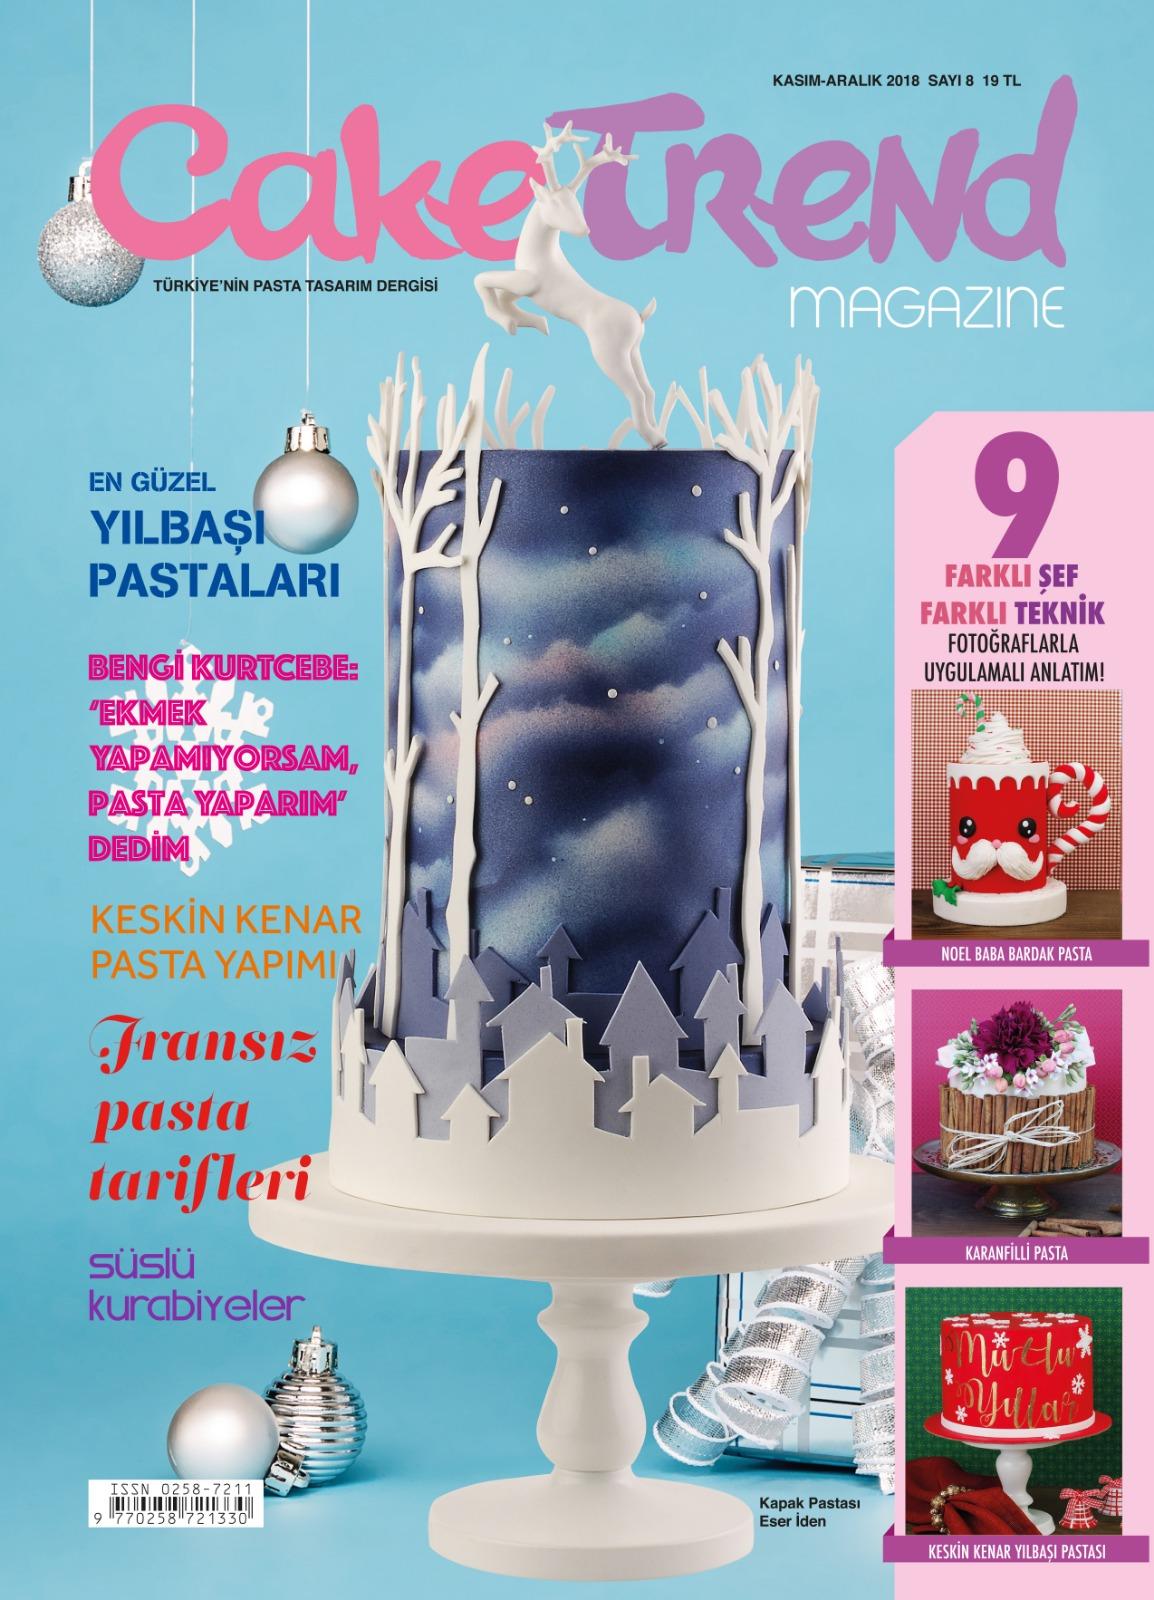 Cake Trend Dergisi Sayi 8 Kasim Aralik 2018 Yilbasi Sayisi